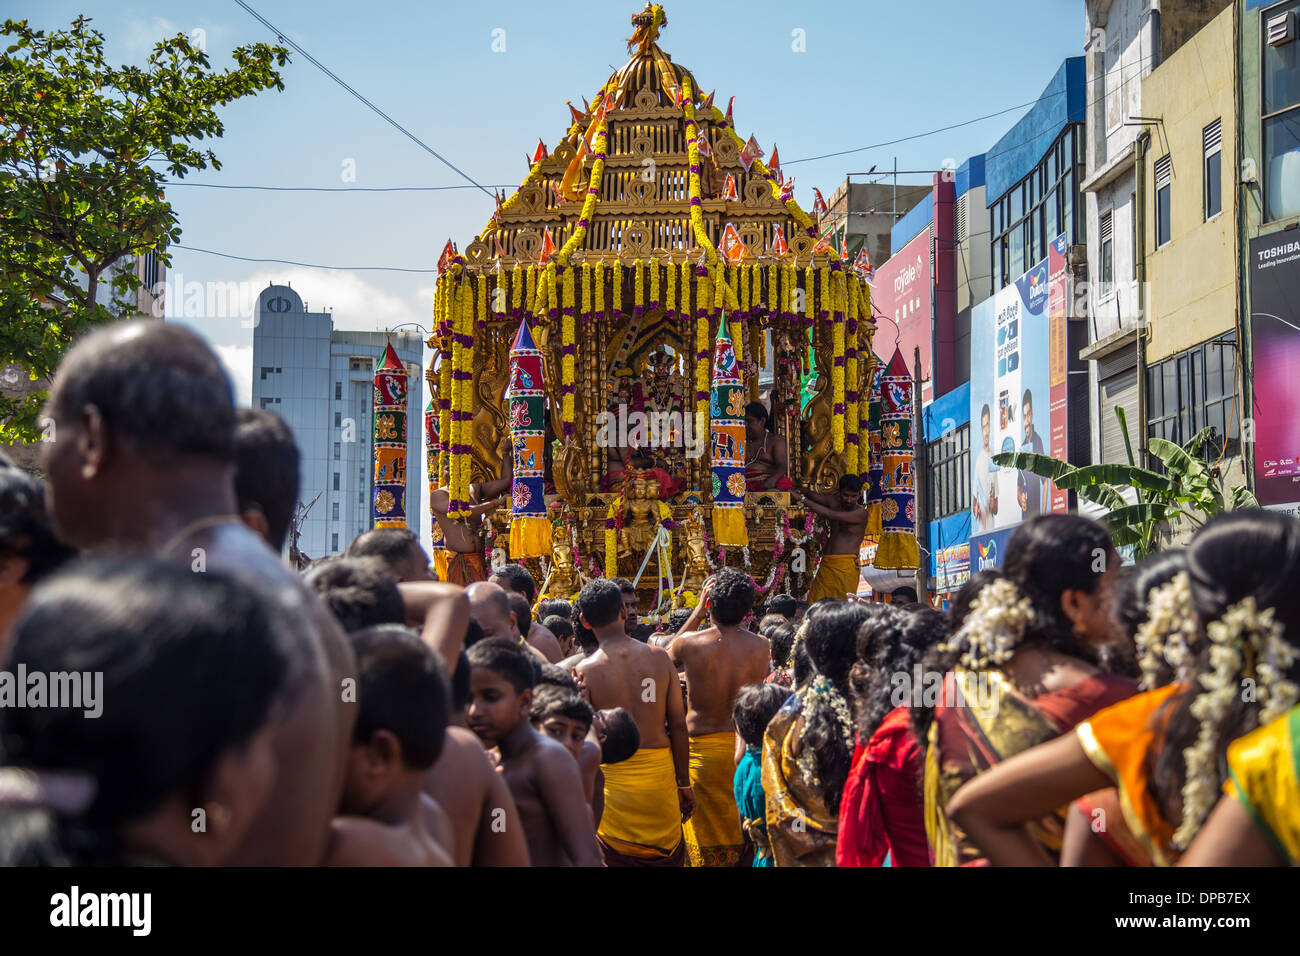 Aarupadai Veedu Temples - Six Abodes of Murugan